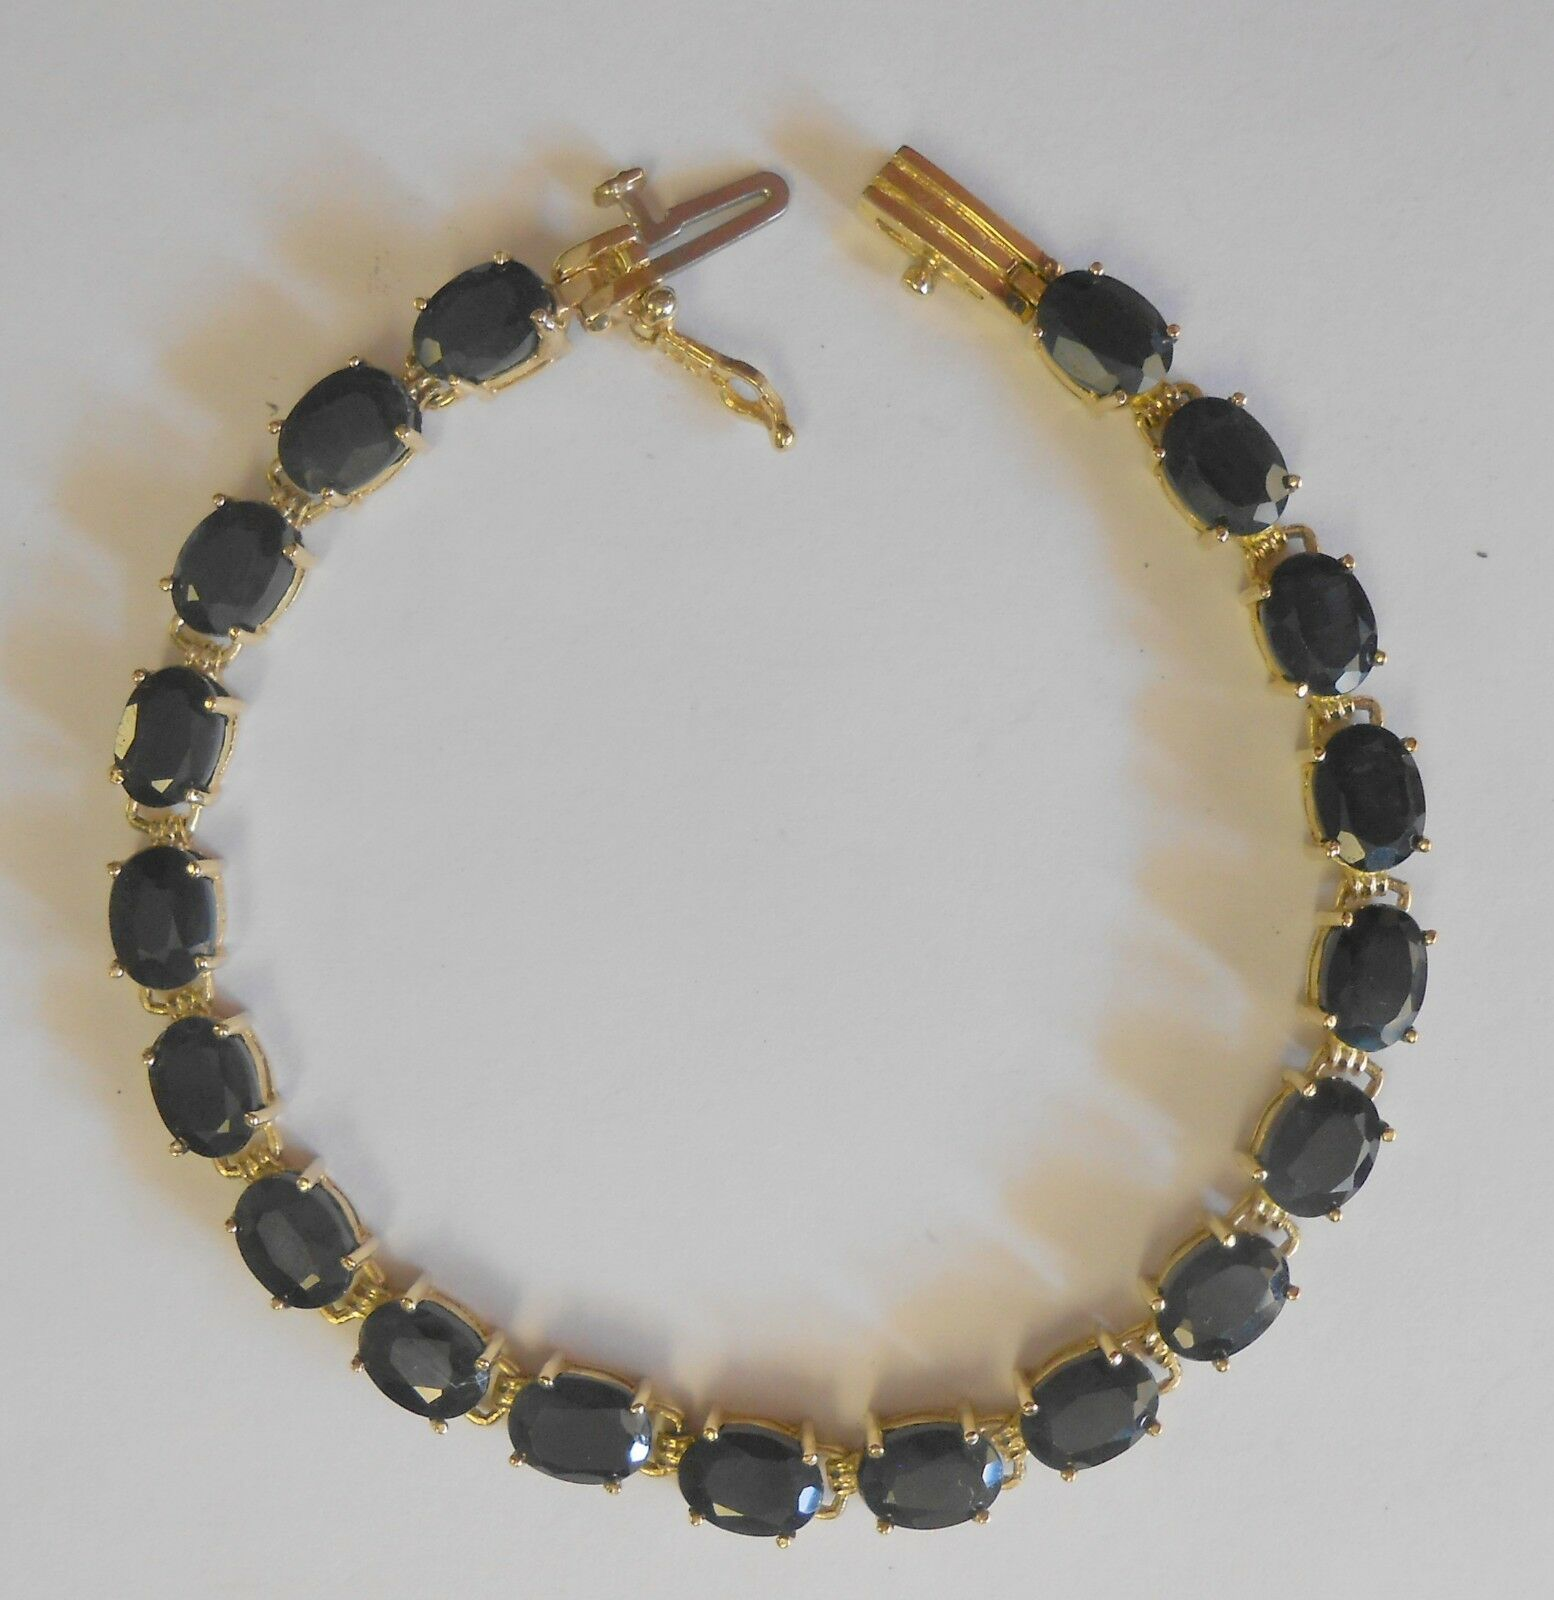 Lrg 7 mm Dark blueee Sapphire 10K Yellow gold Tennis Bracelet Bracelet 7